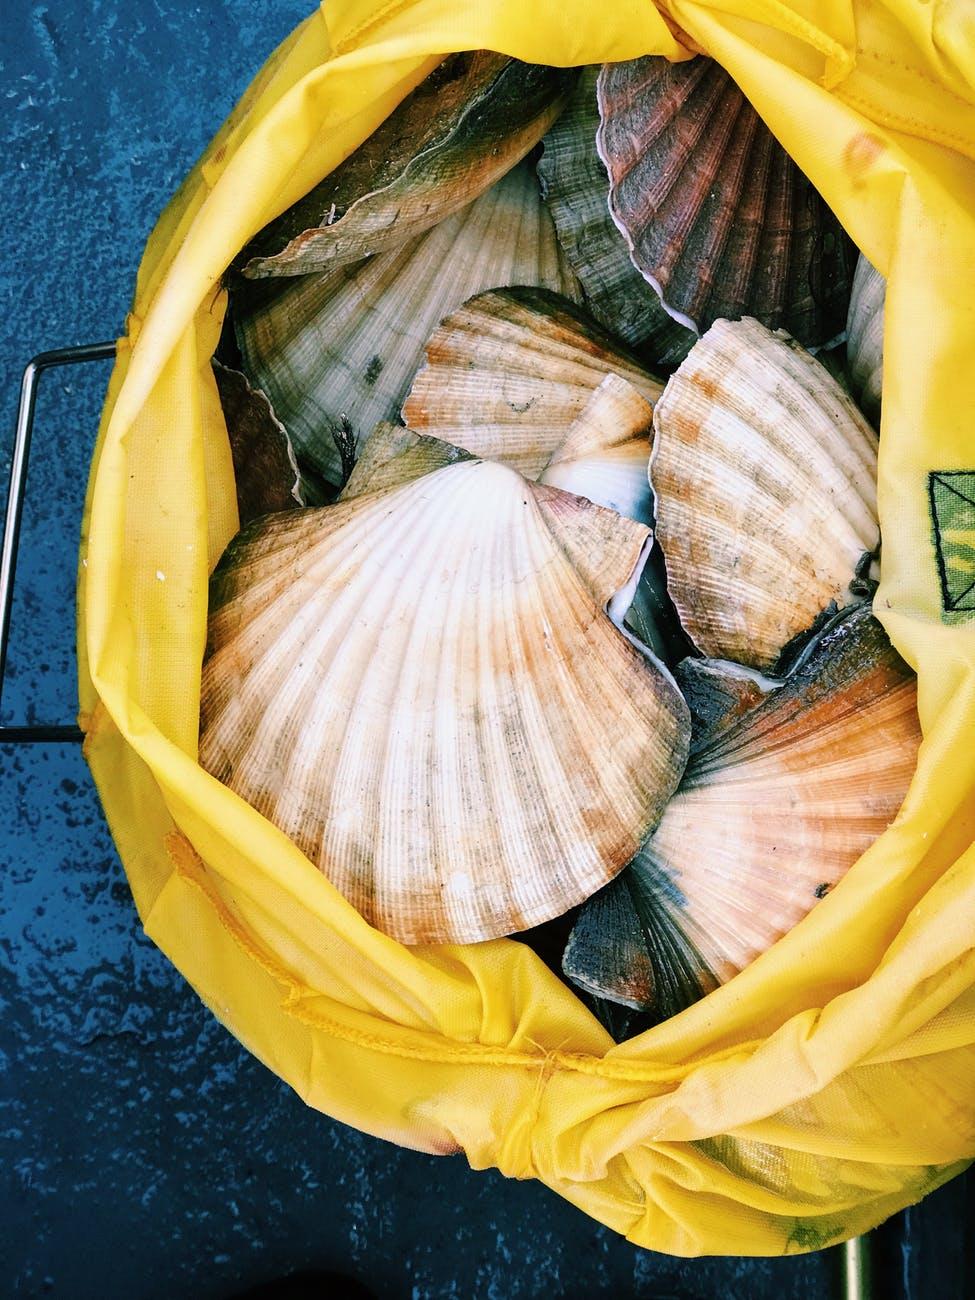 seashells in a bag